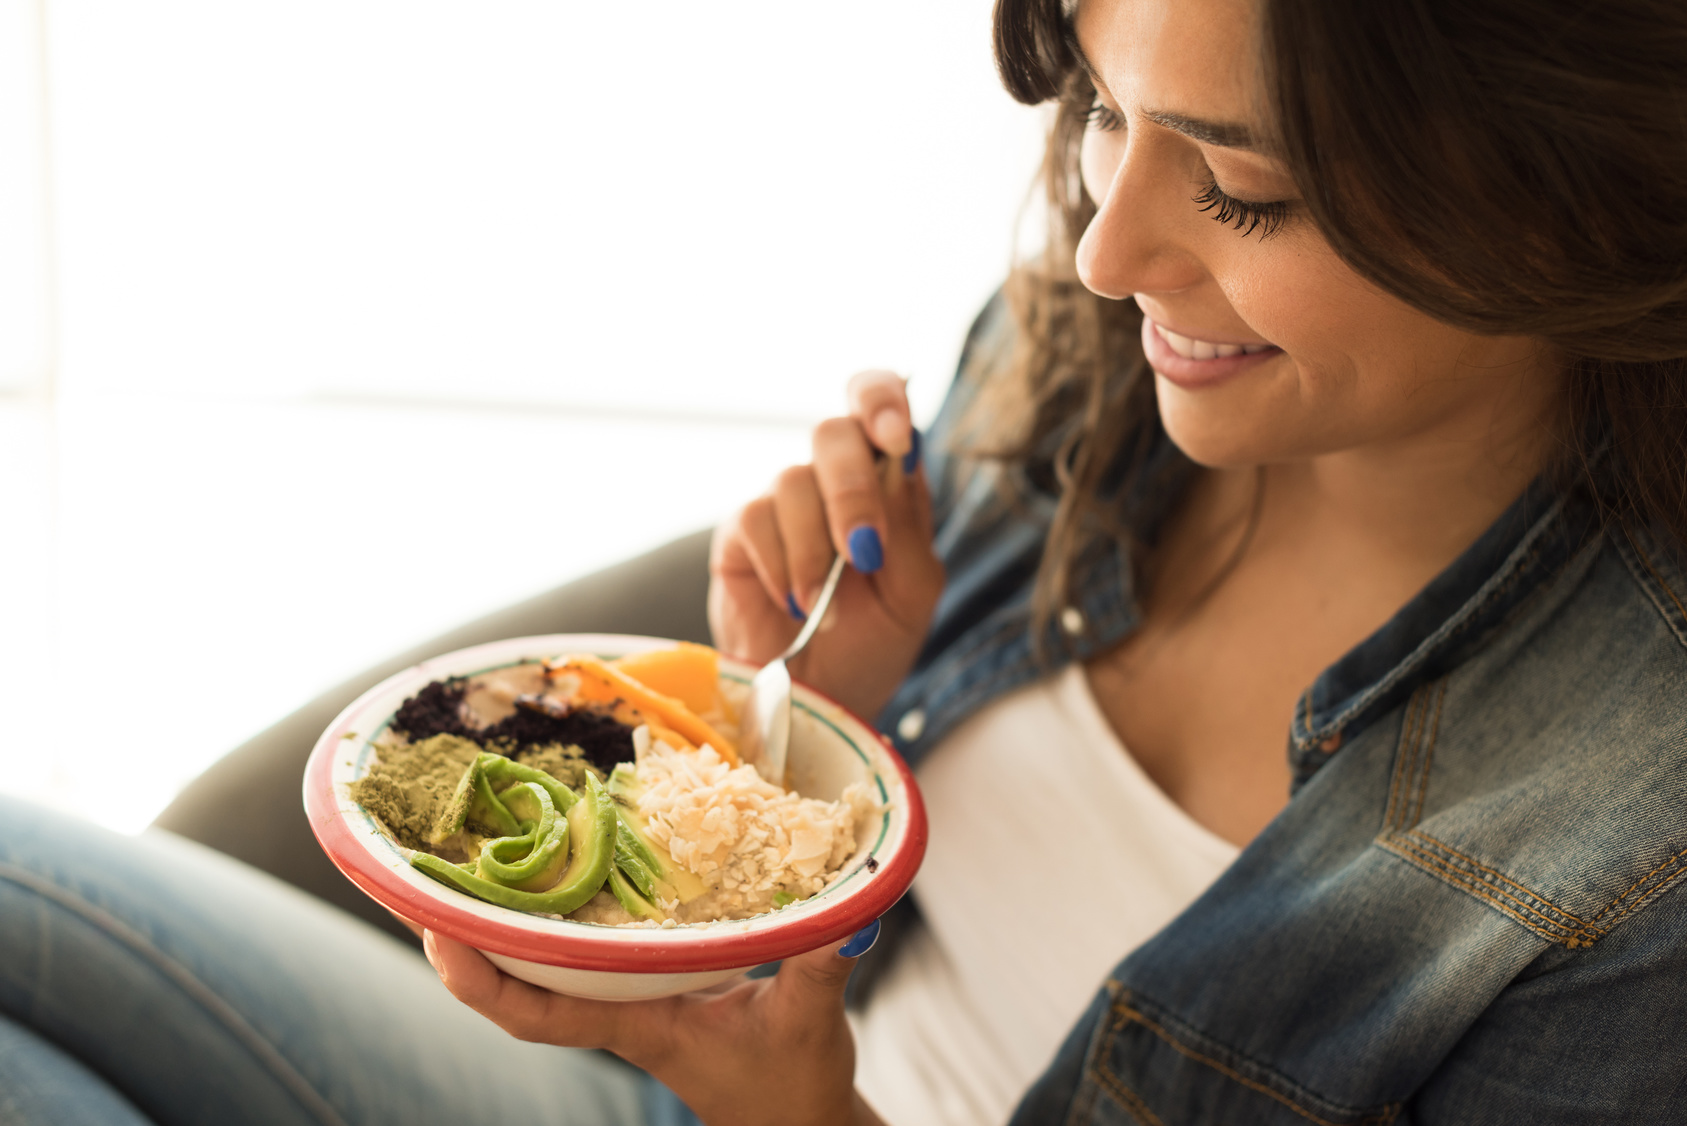 Problemas para ir al ba o 10 alimentos que deber as - Alimentos para ir al bano inmediatamente ...